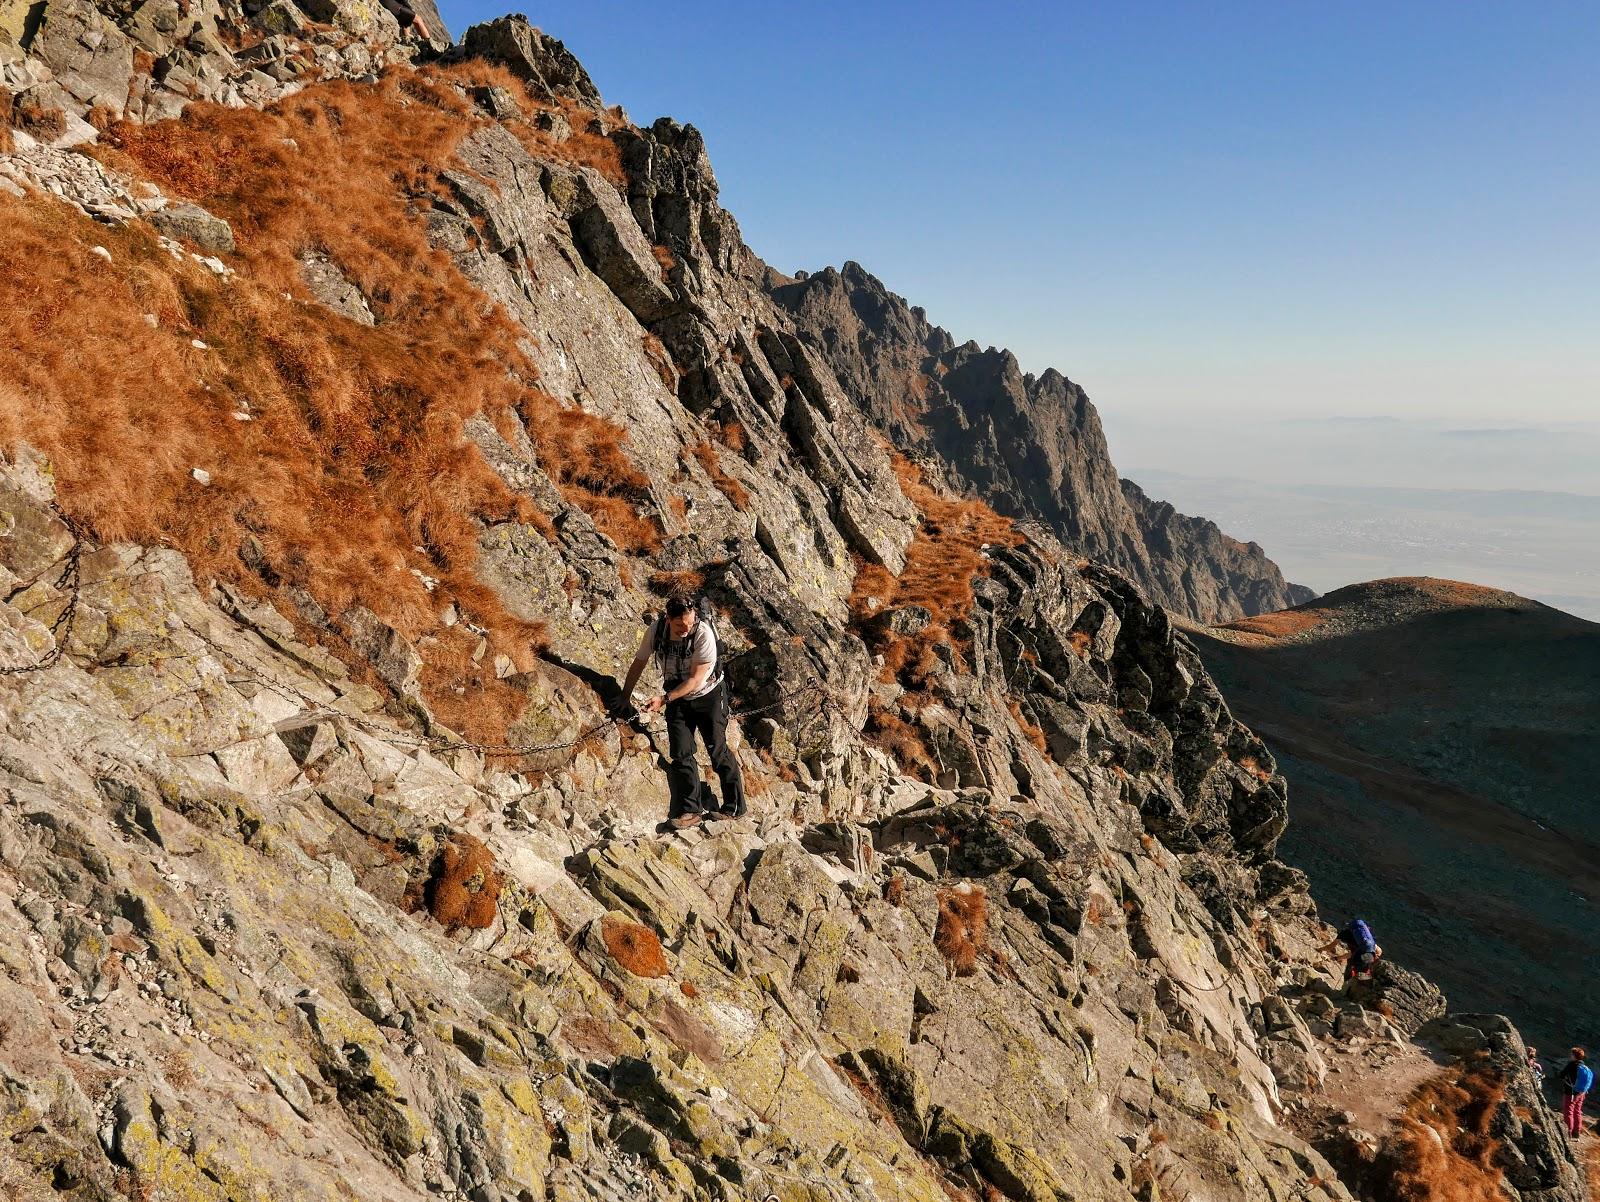 tatry szlak Polski Grzebień Poľský hrebeň